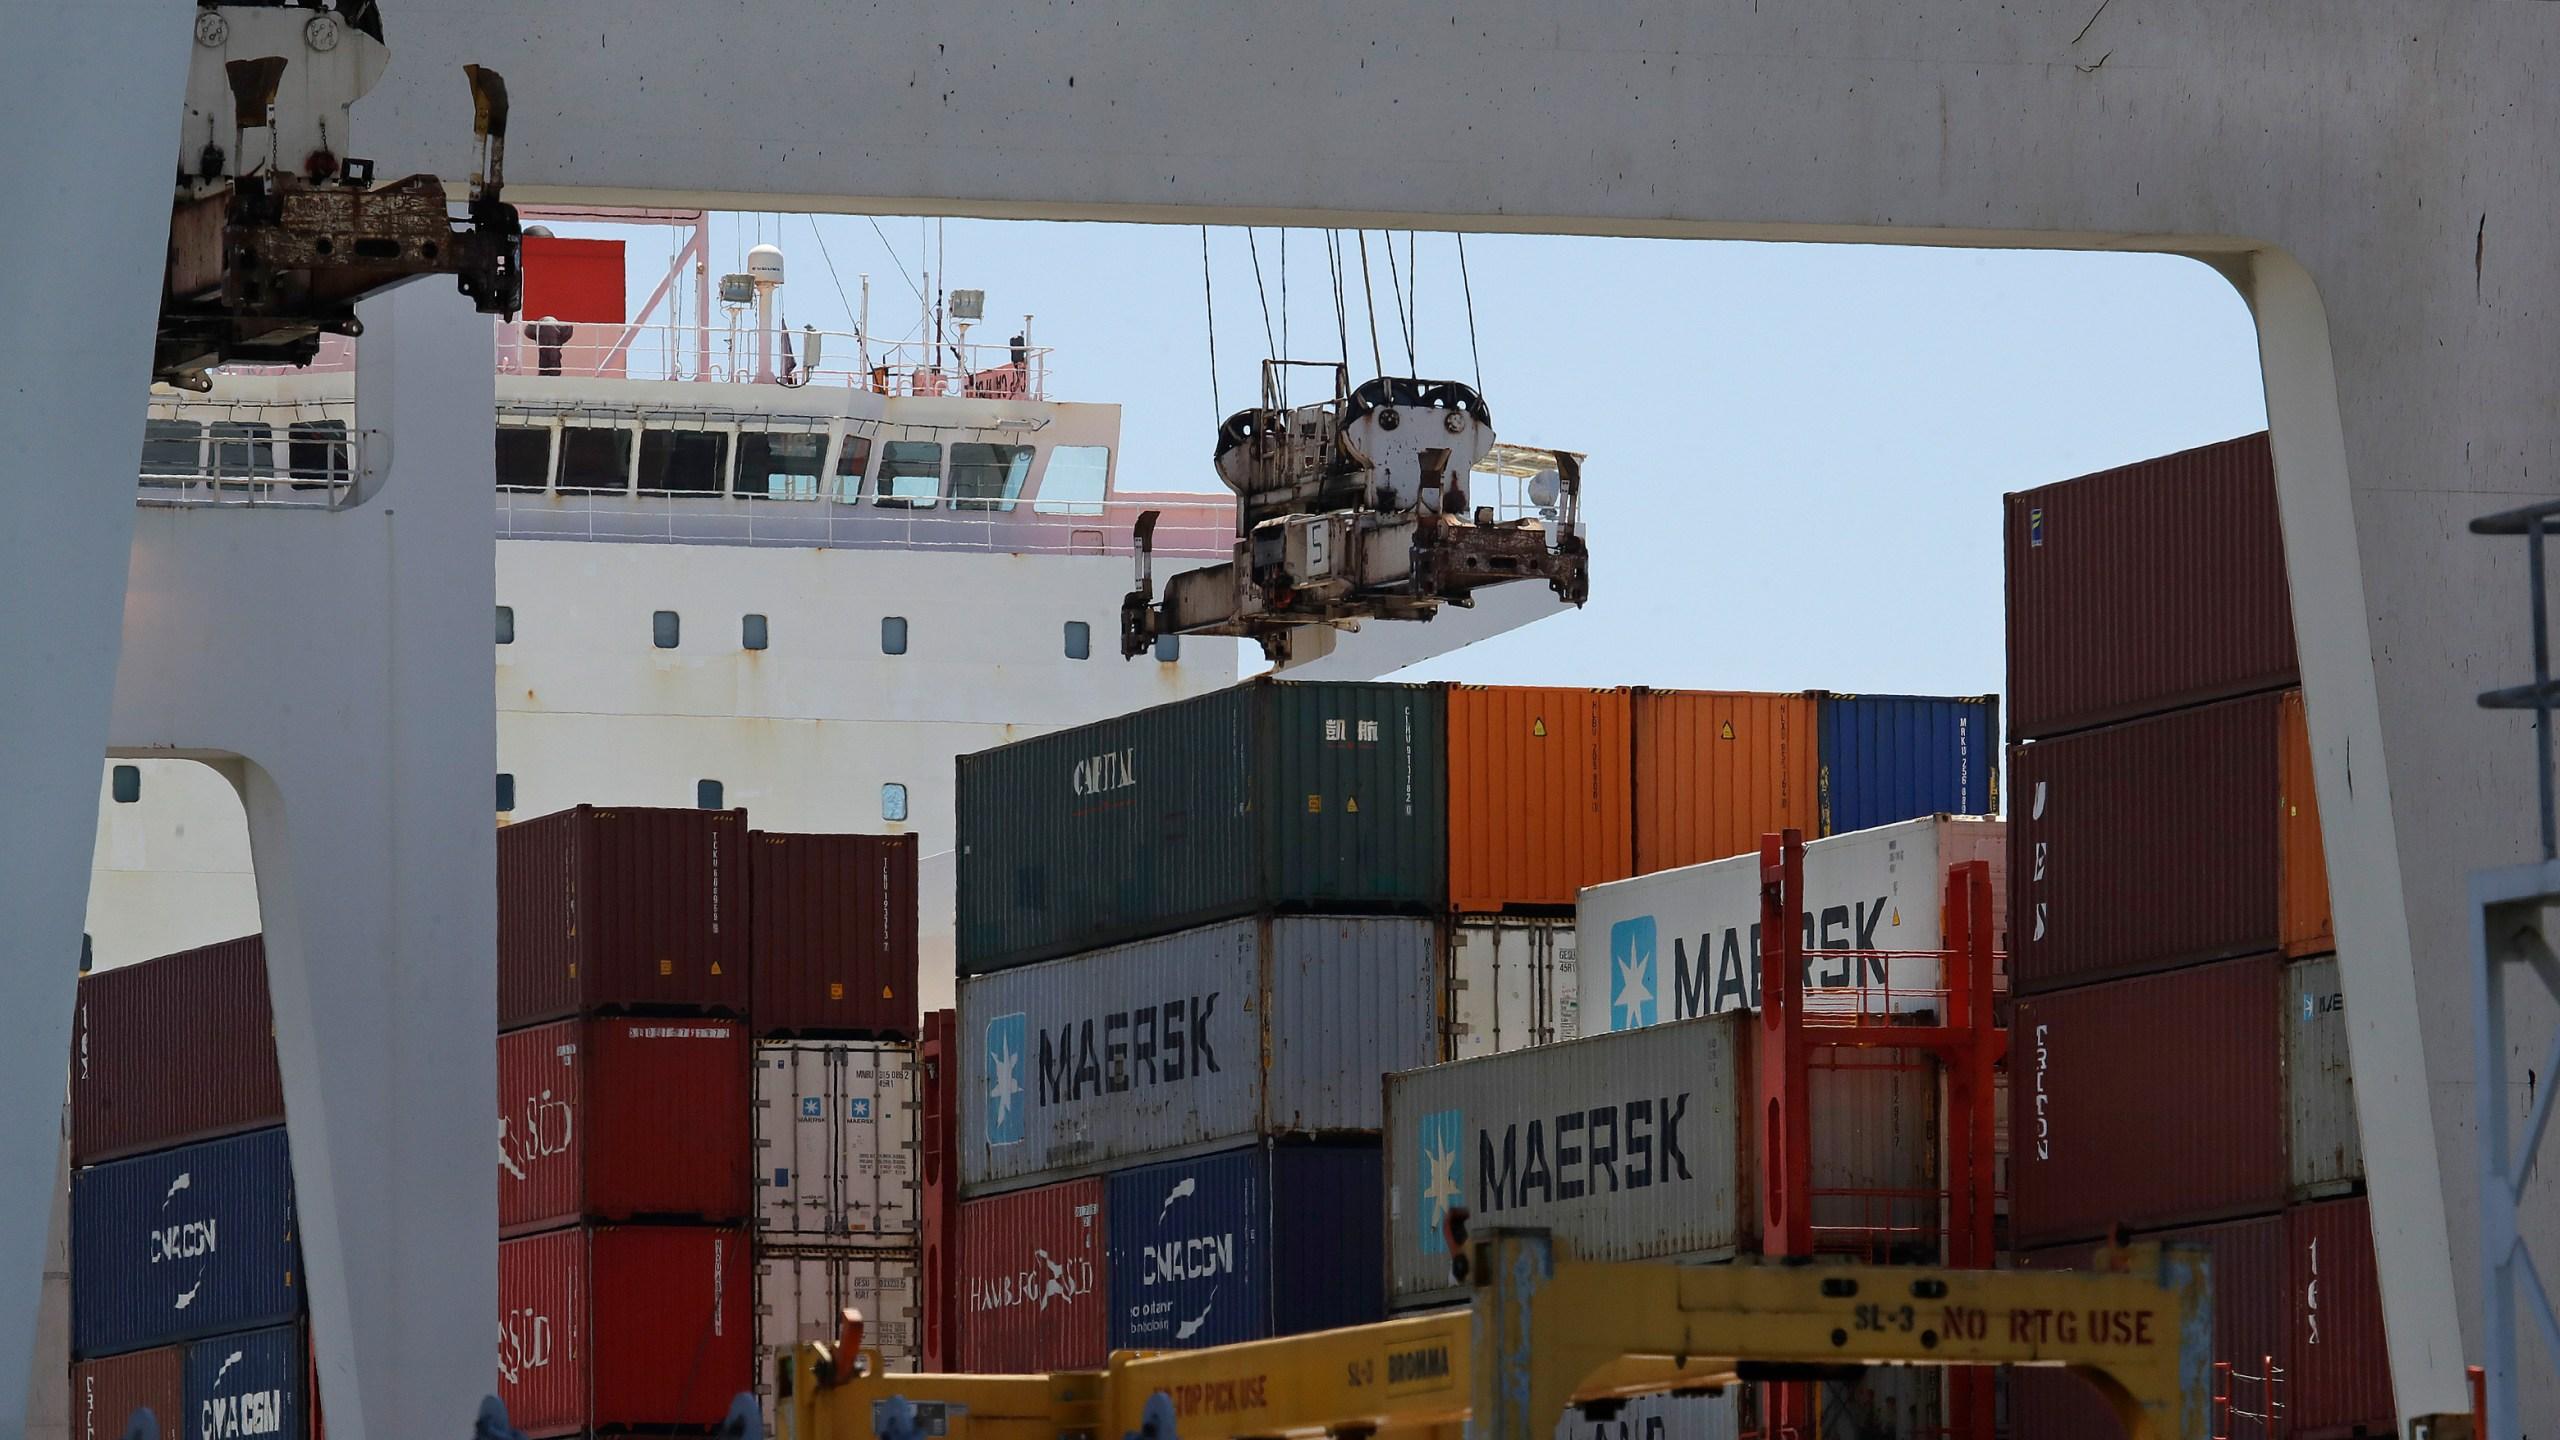 Container Ship Kota Ekspres Unloaded